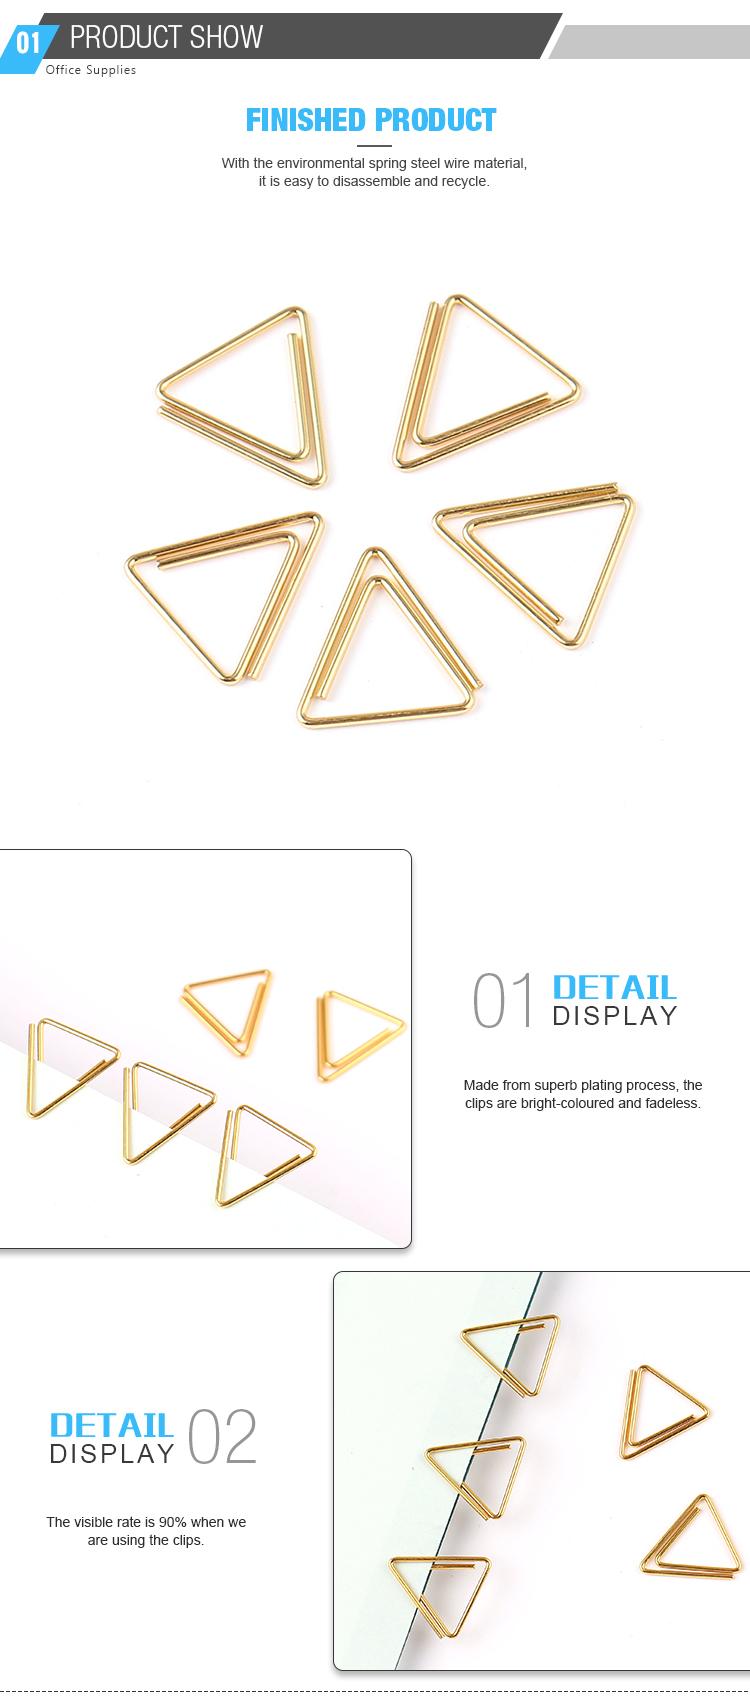 Logotipo Personalizado Design japonês Ouro Clipe de Papel Clipe De Papel Triângulo Especial